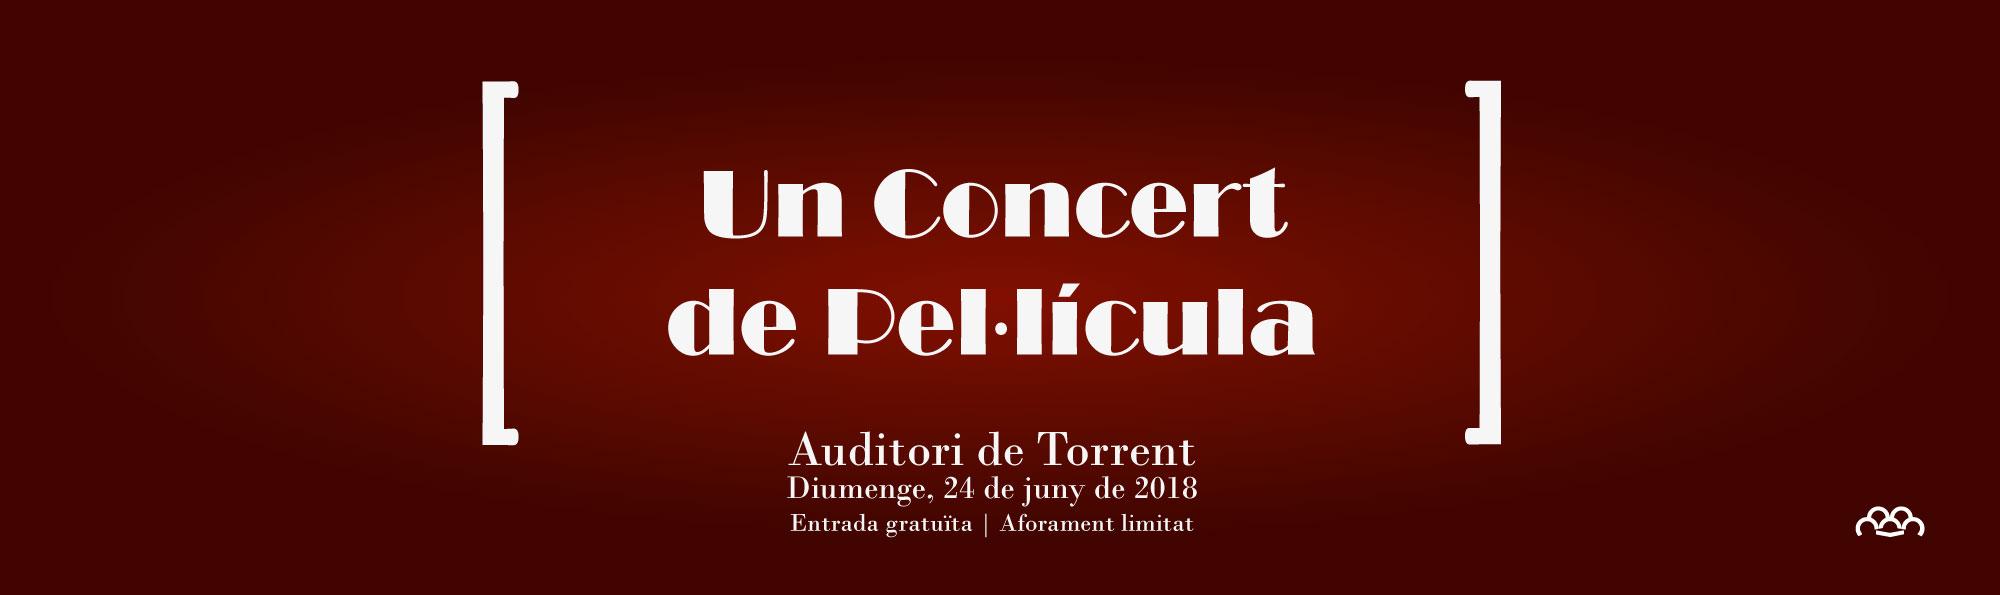 Matrícula abierta - Curso 2017-2018 - 13 de septiembre - 18:00h-19:00h Centro Cultural Sant Marc